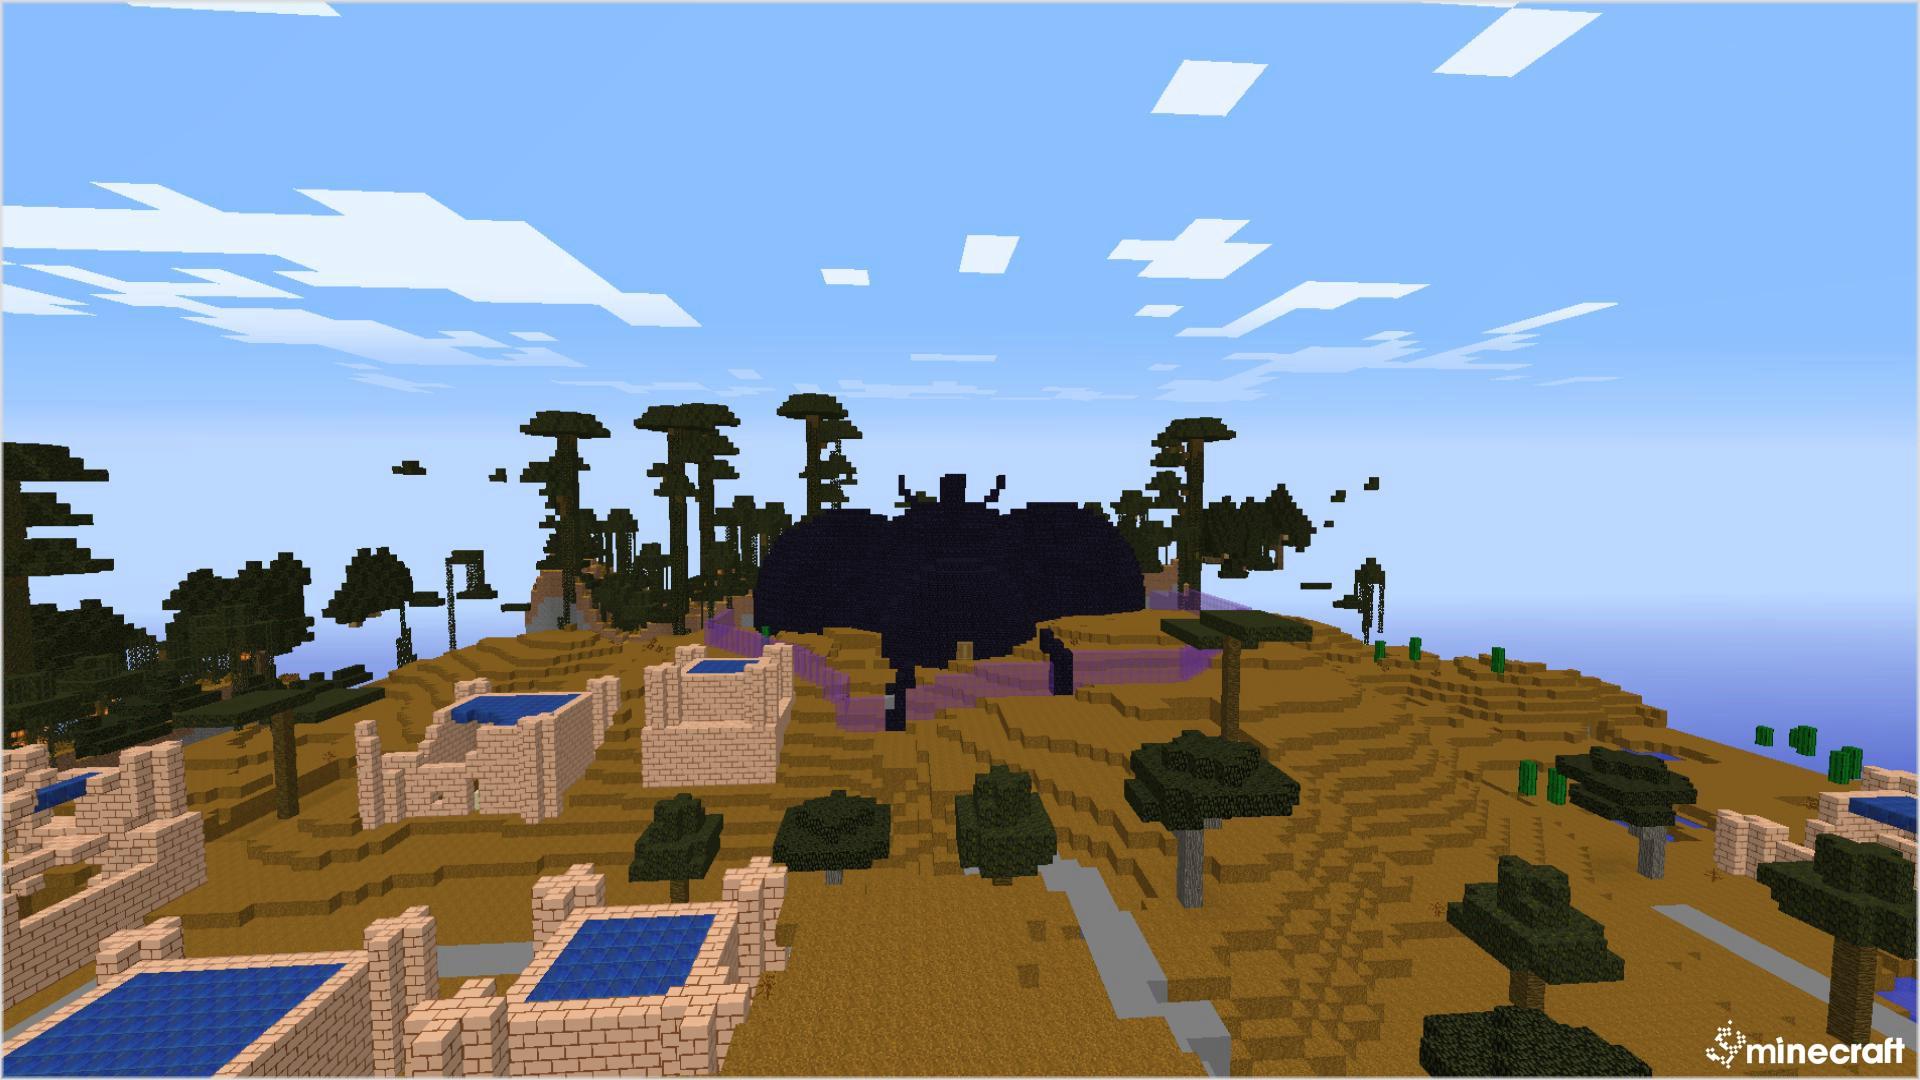 http://minecraft-forum.net/wp-content/uploads/2013/12/9f907__The-Safari-Map-4.jpg